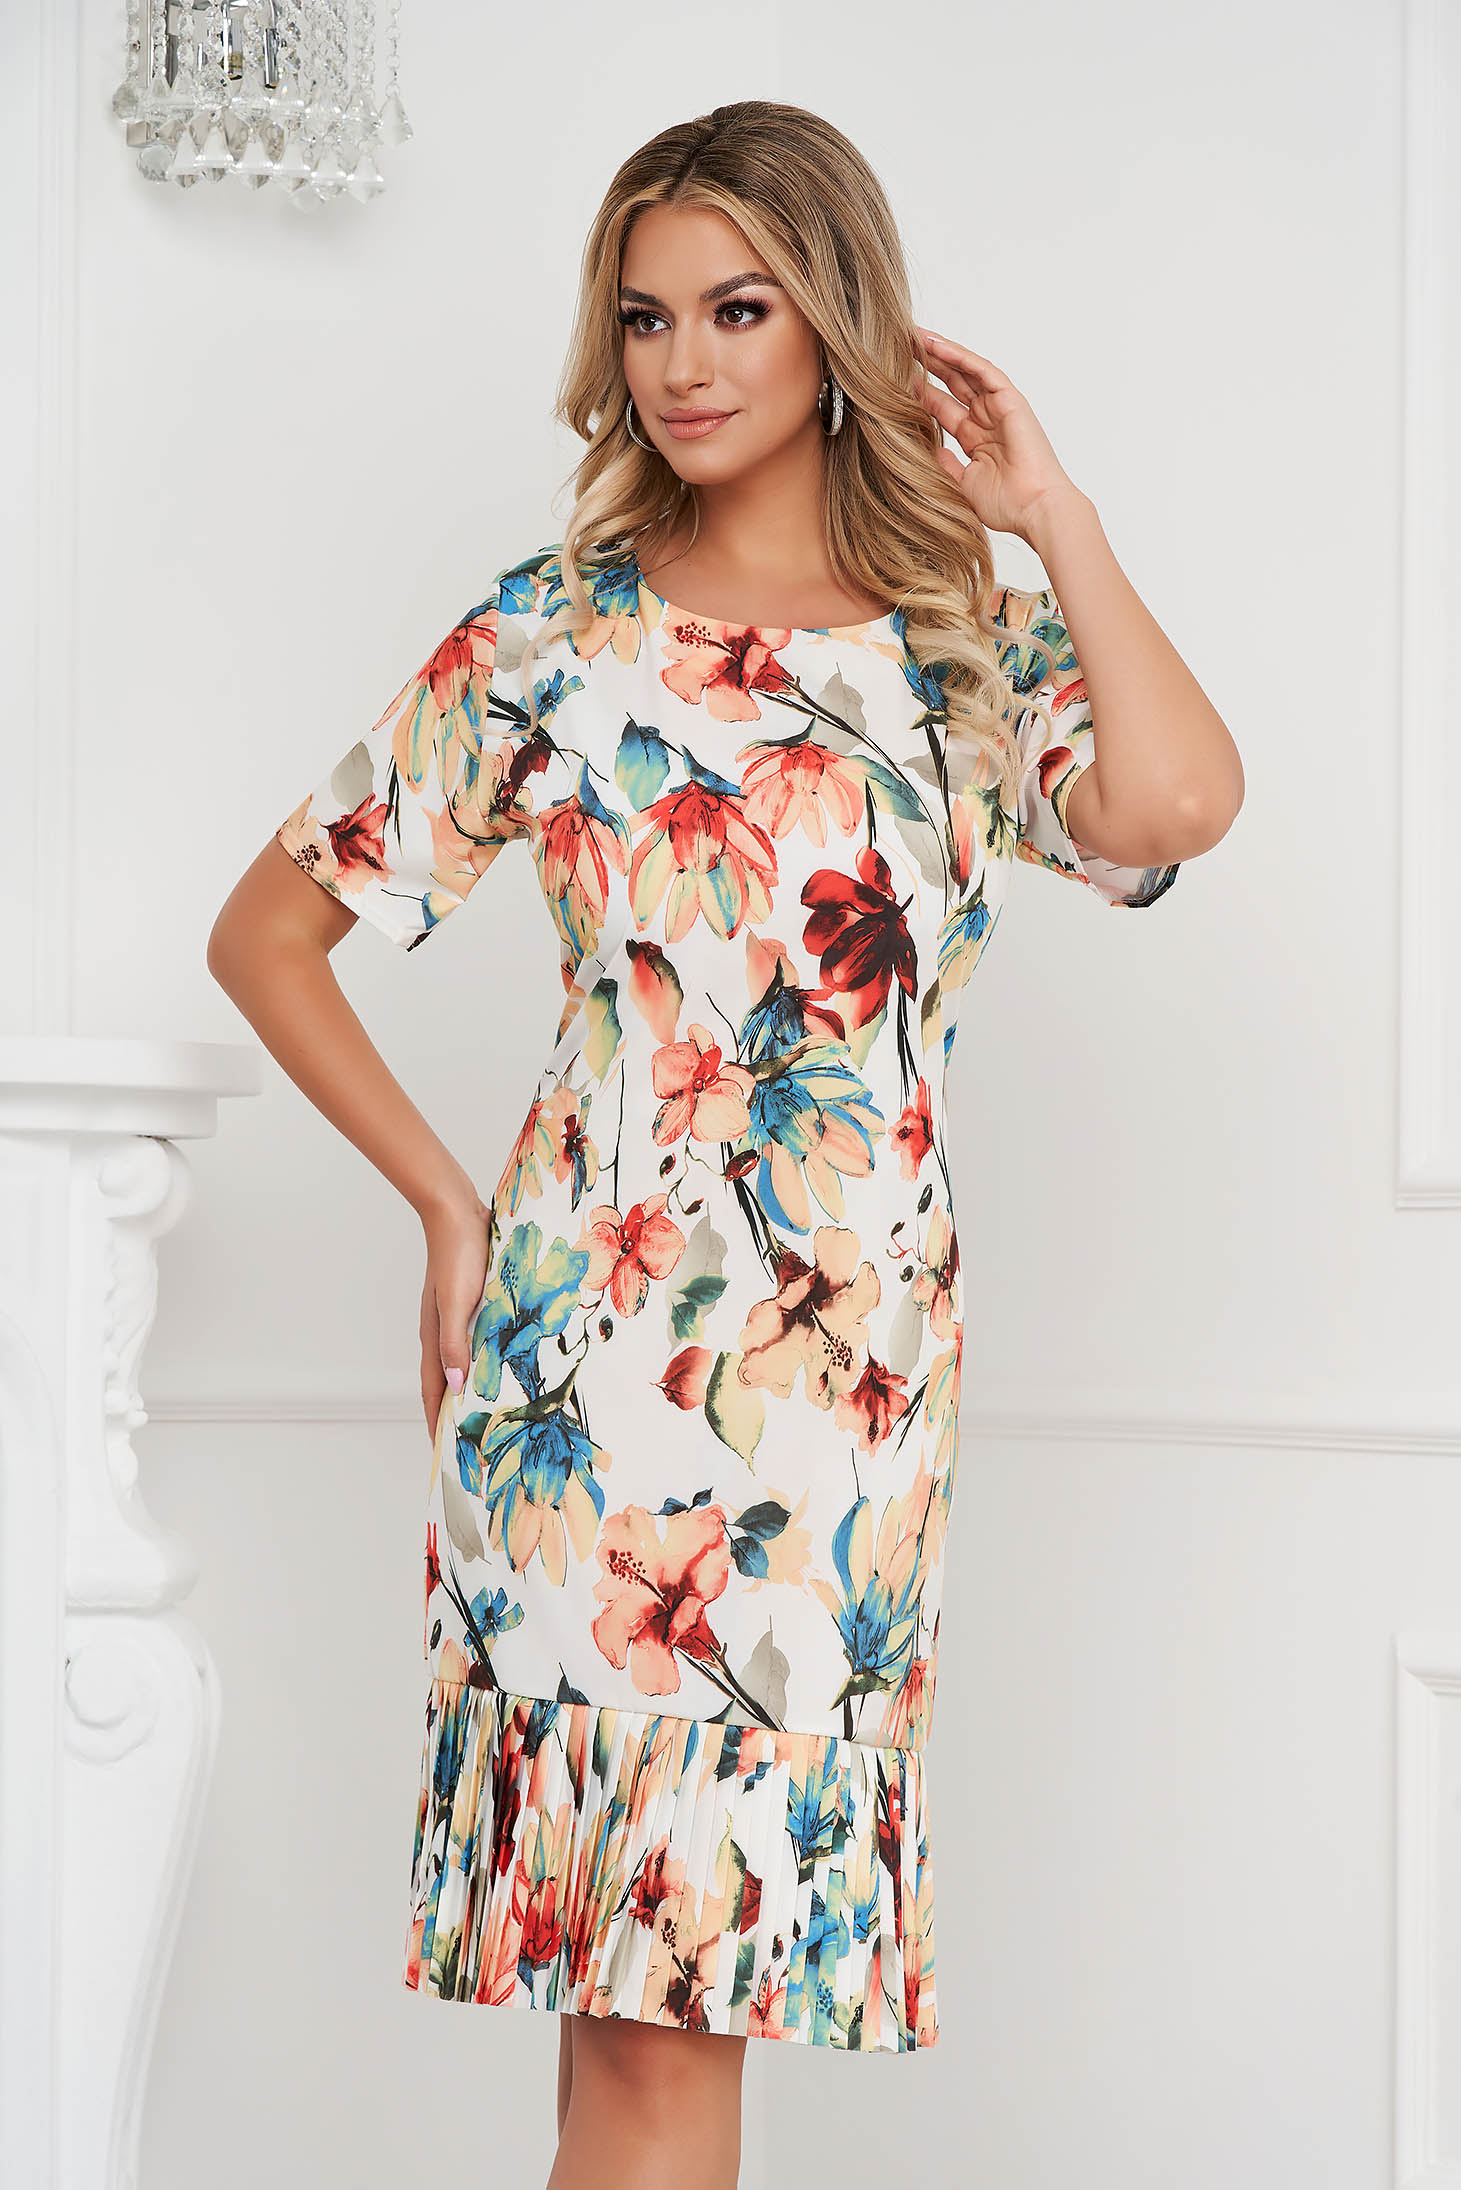 Rochie cu imprimeu floral cu un croi drept cu pliuri de material